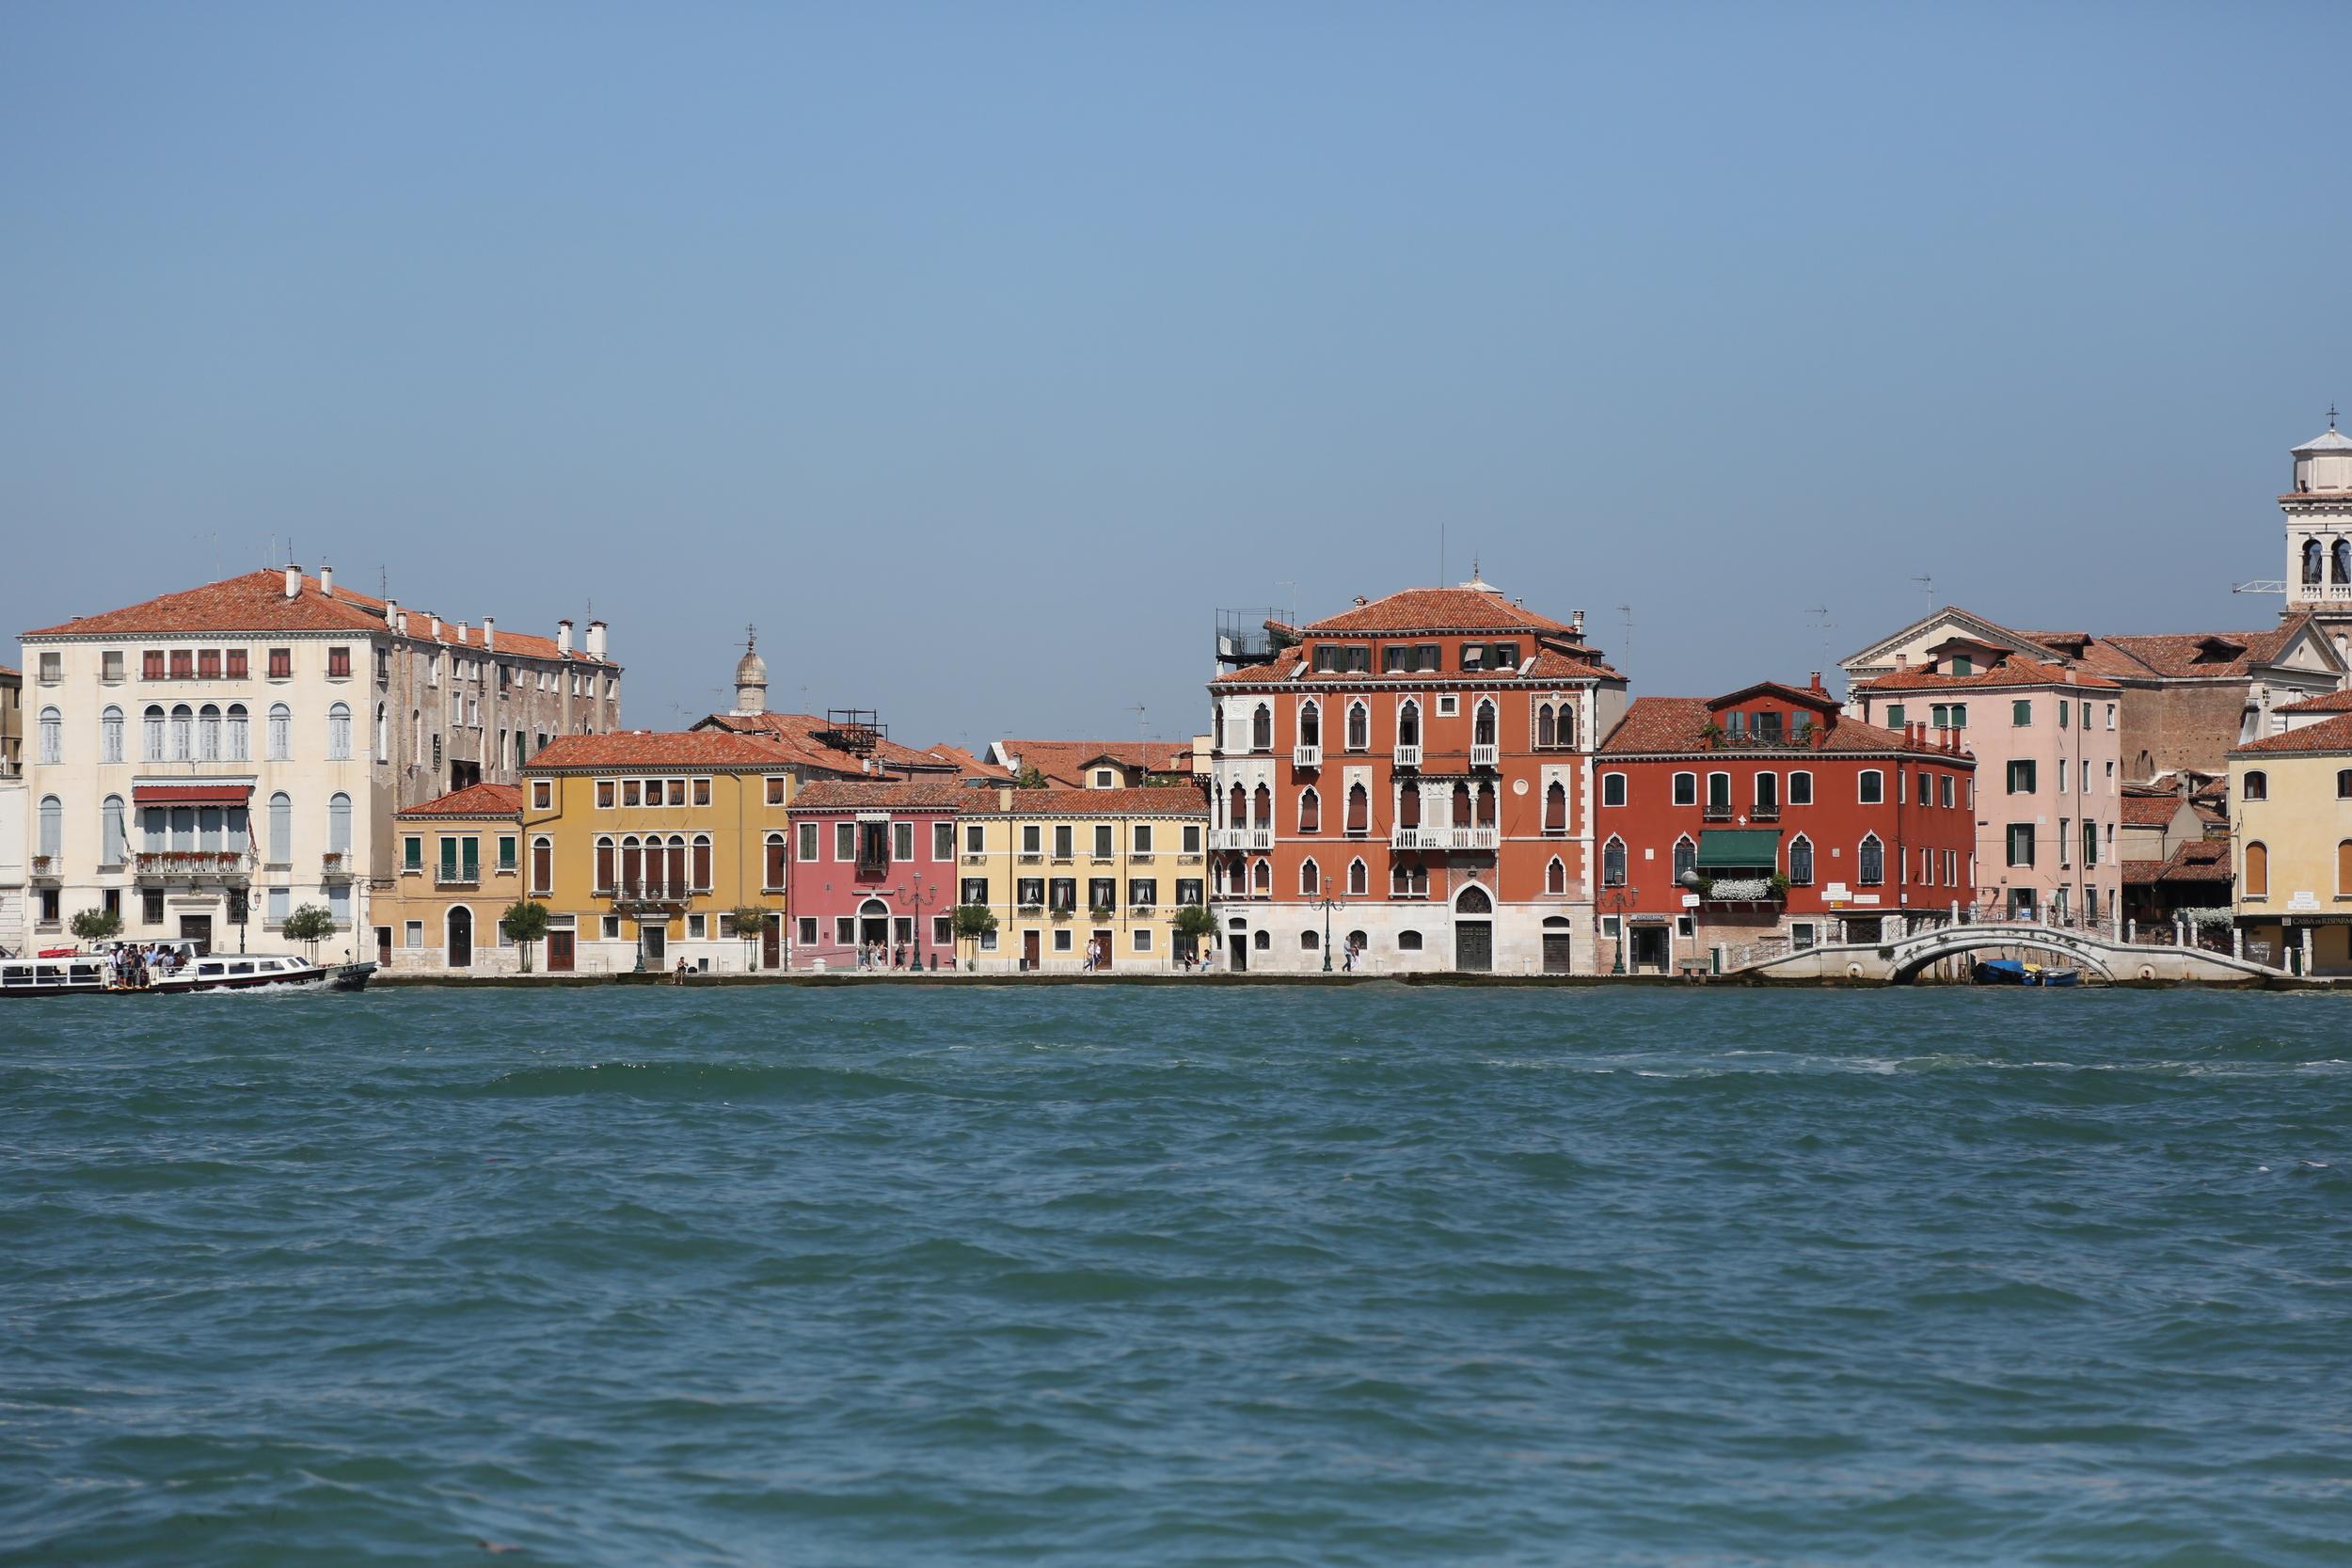 1209_Venise_0509.JPG